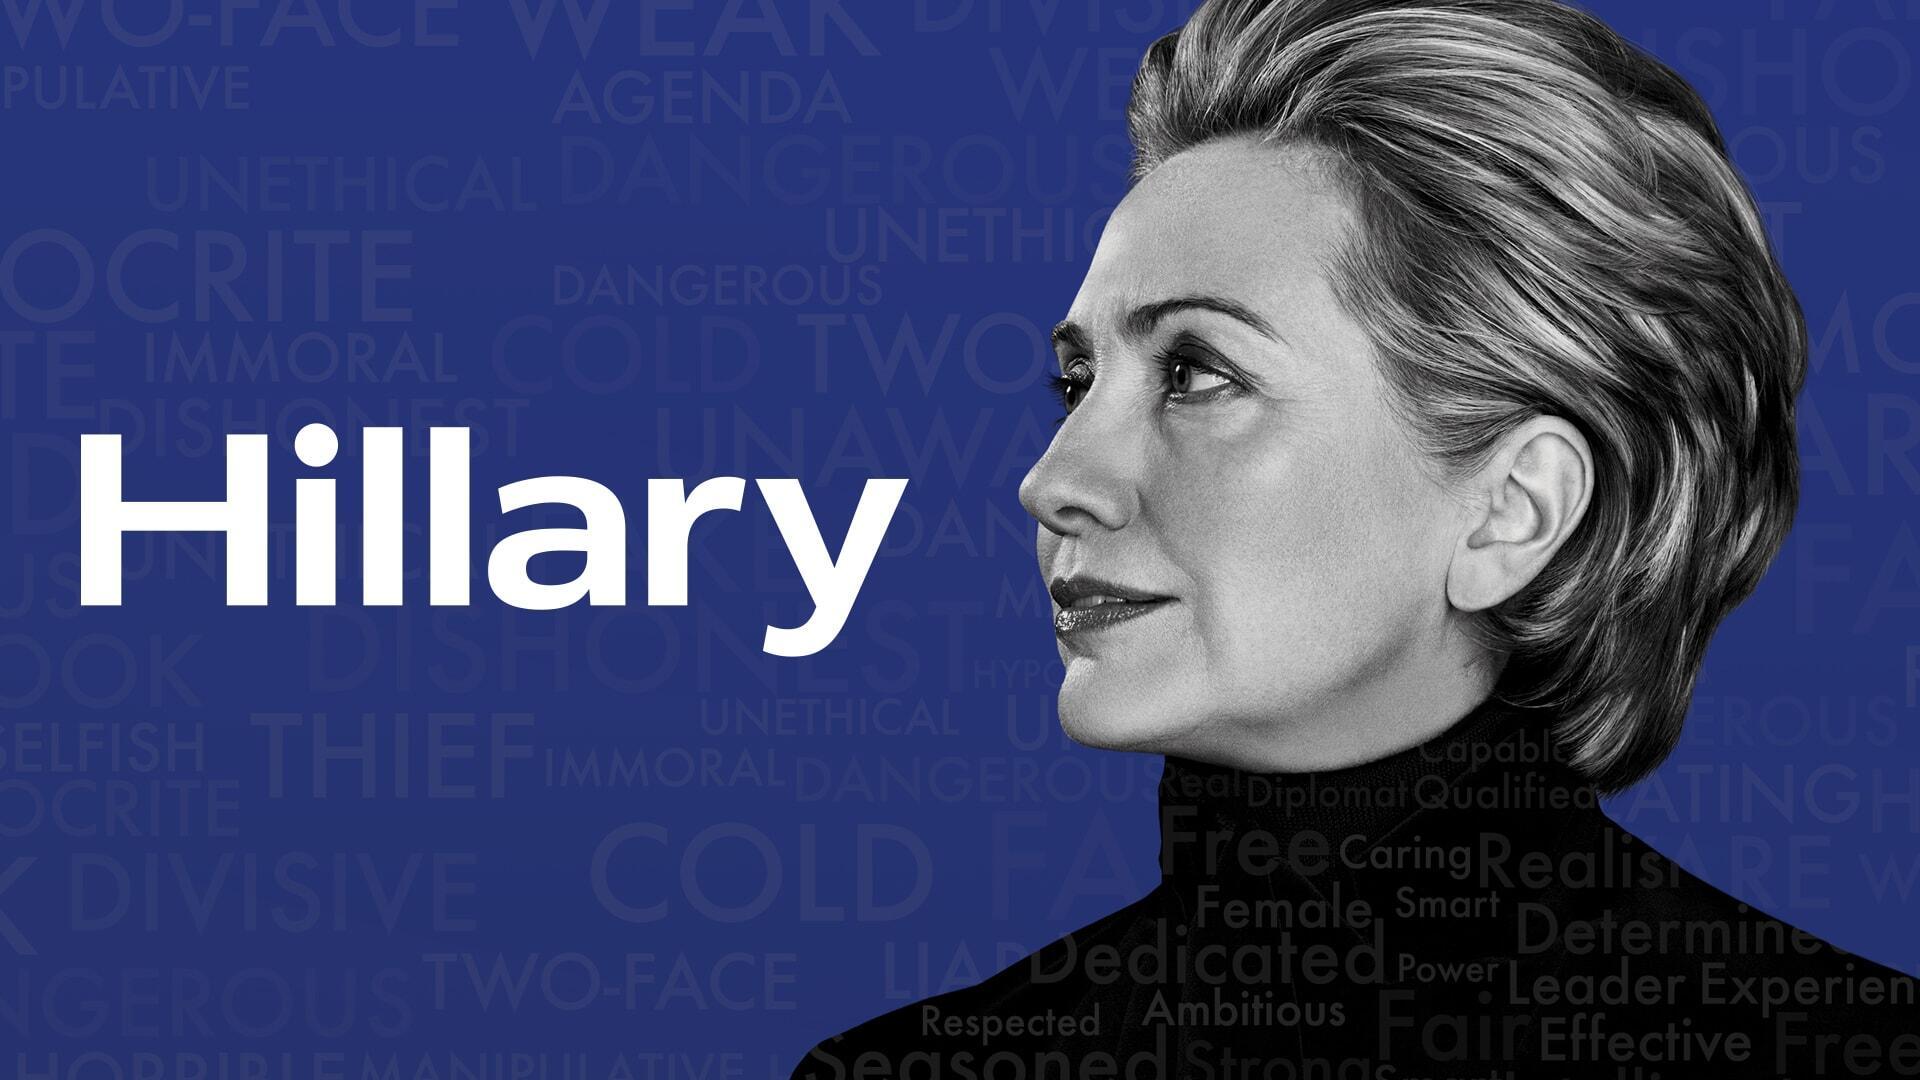 Hillary_16x9